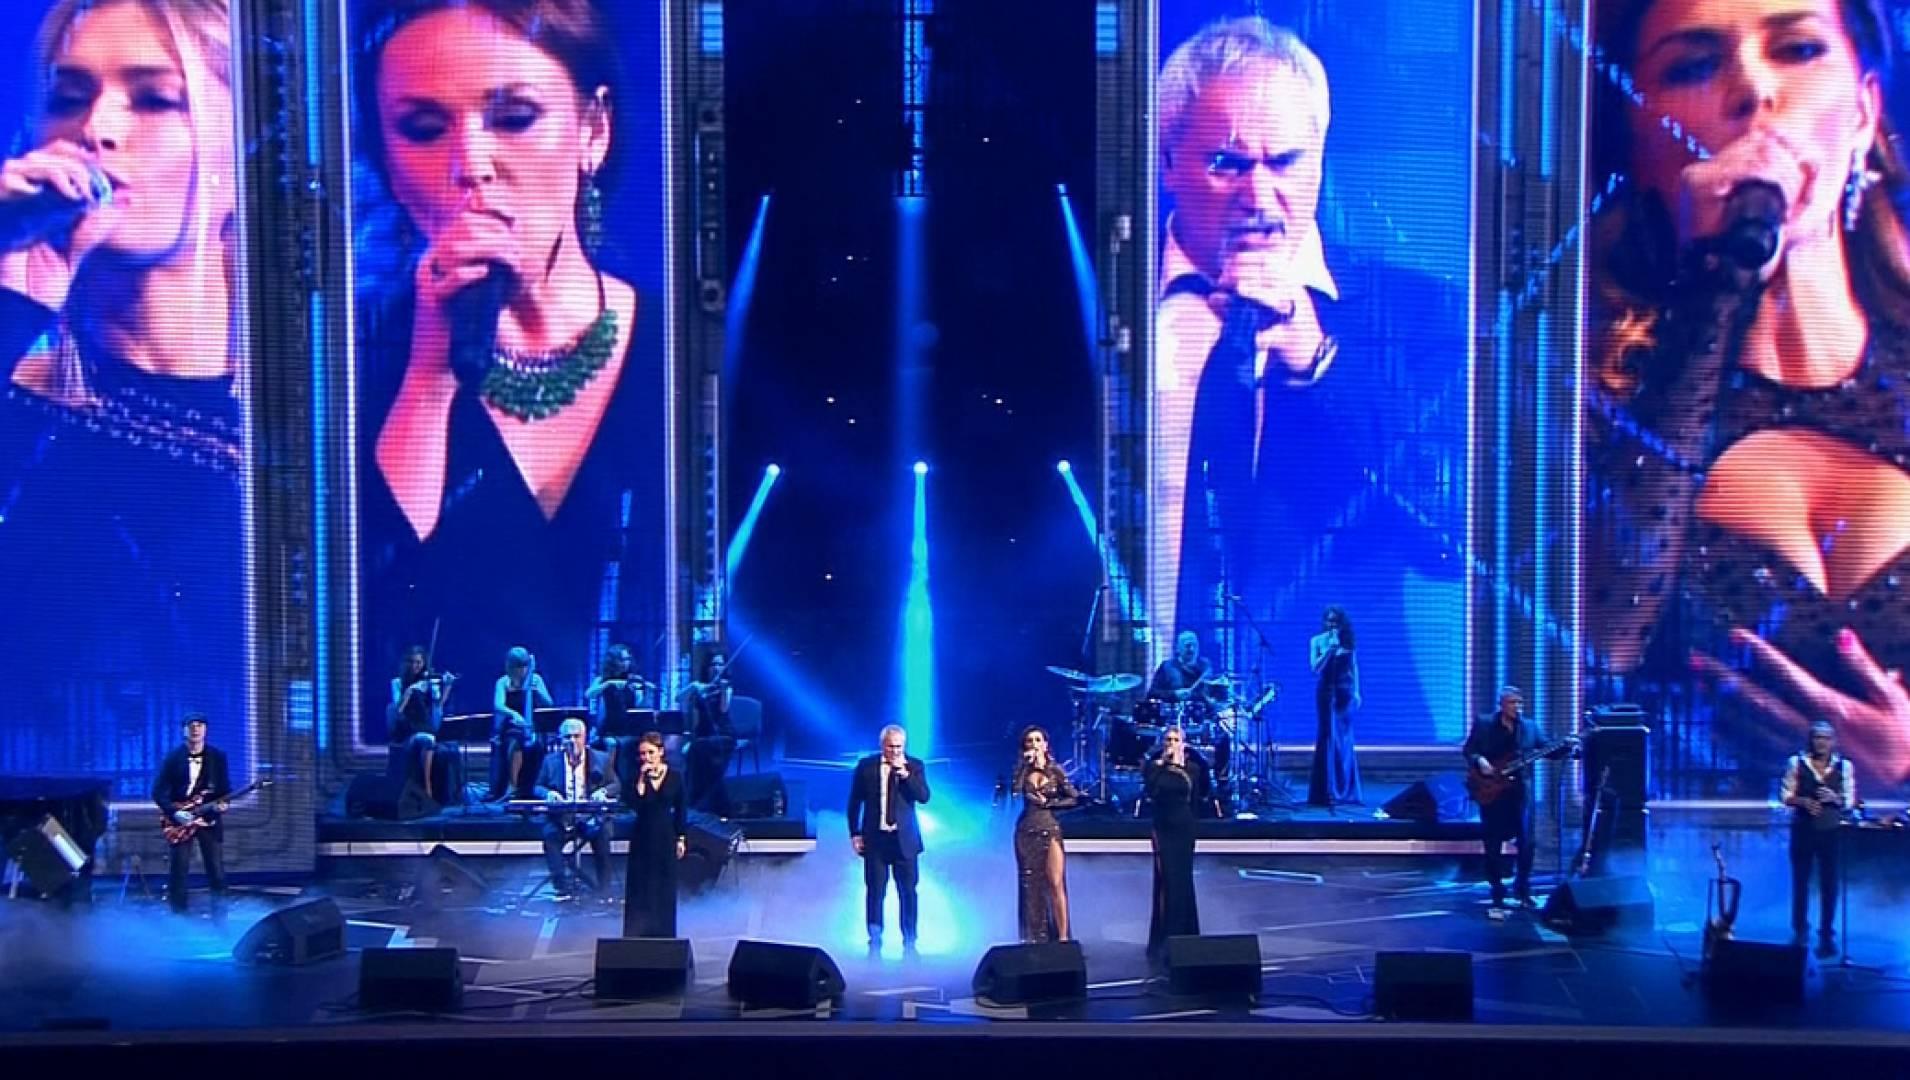 Юбилейный вечер Валерия и Константина Меладзе - Концерт